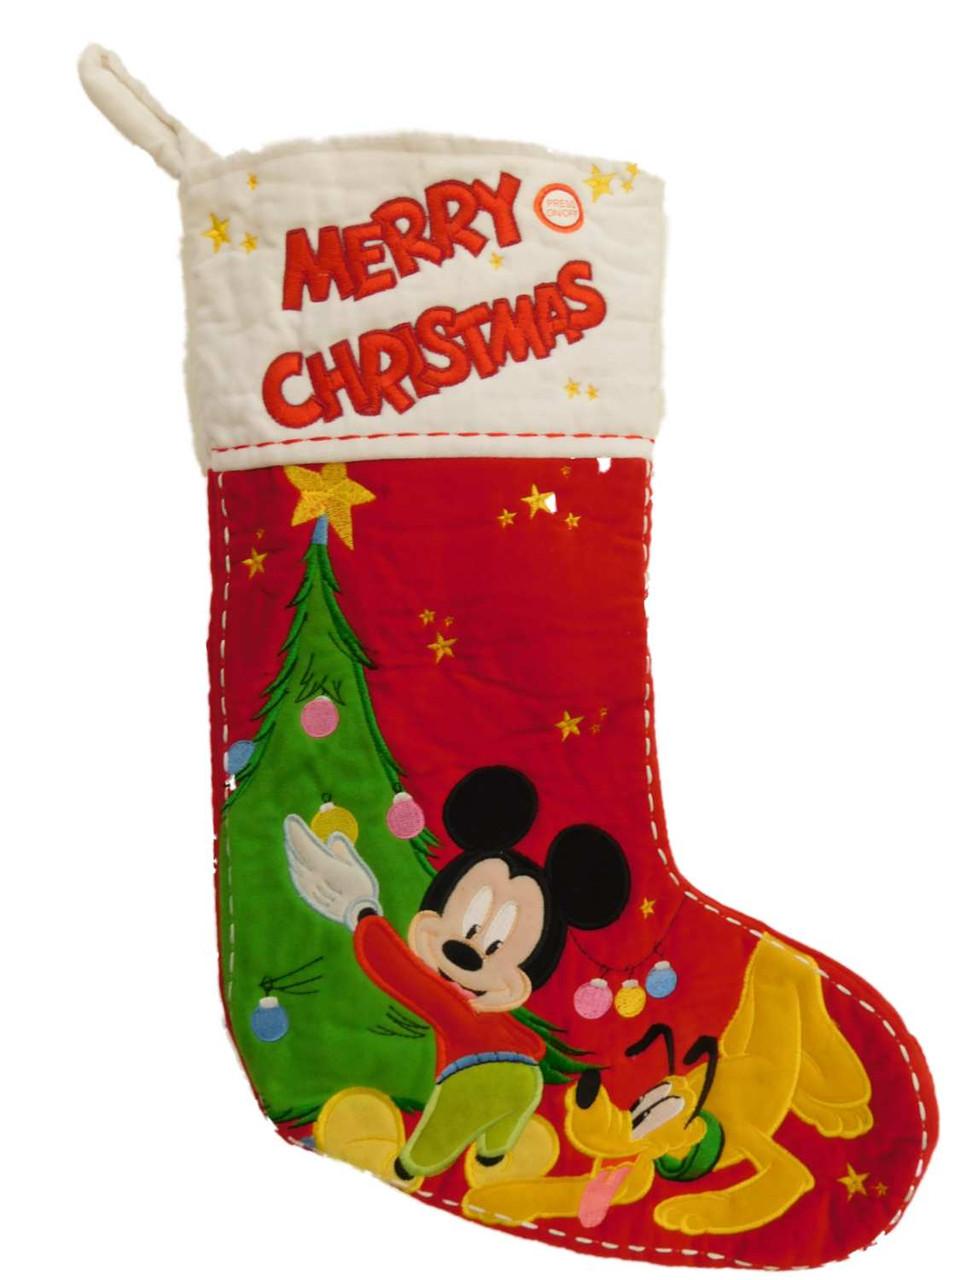 Dog Christmas Stocking.Red White Musical Disney Mickey Mouse Pluto Dog Christmas Stocking